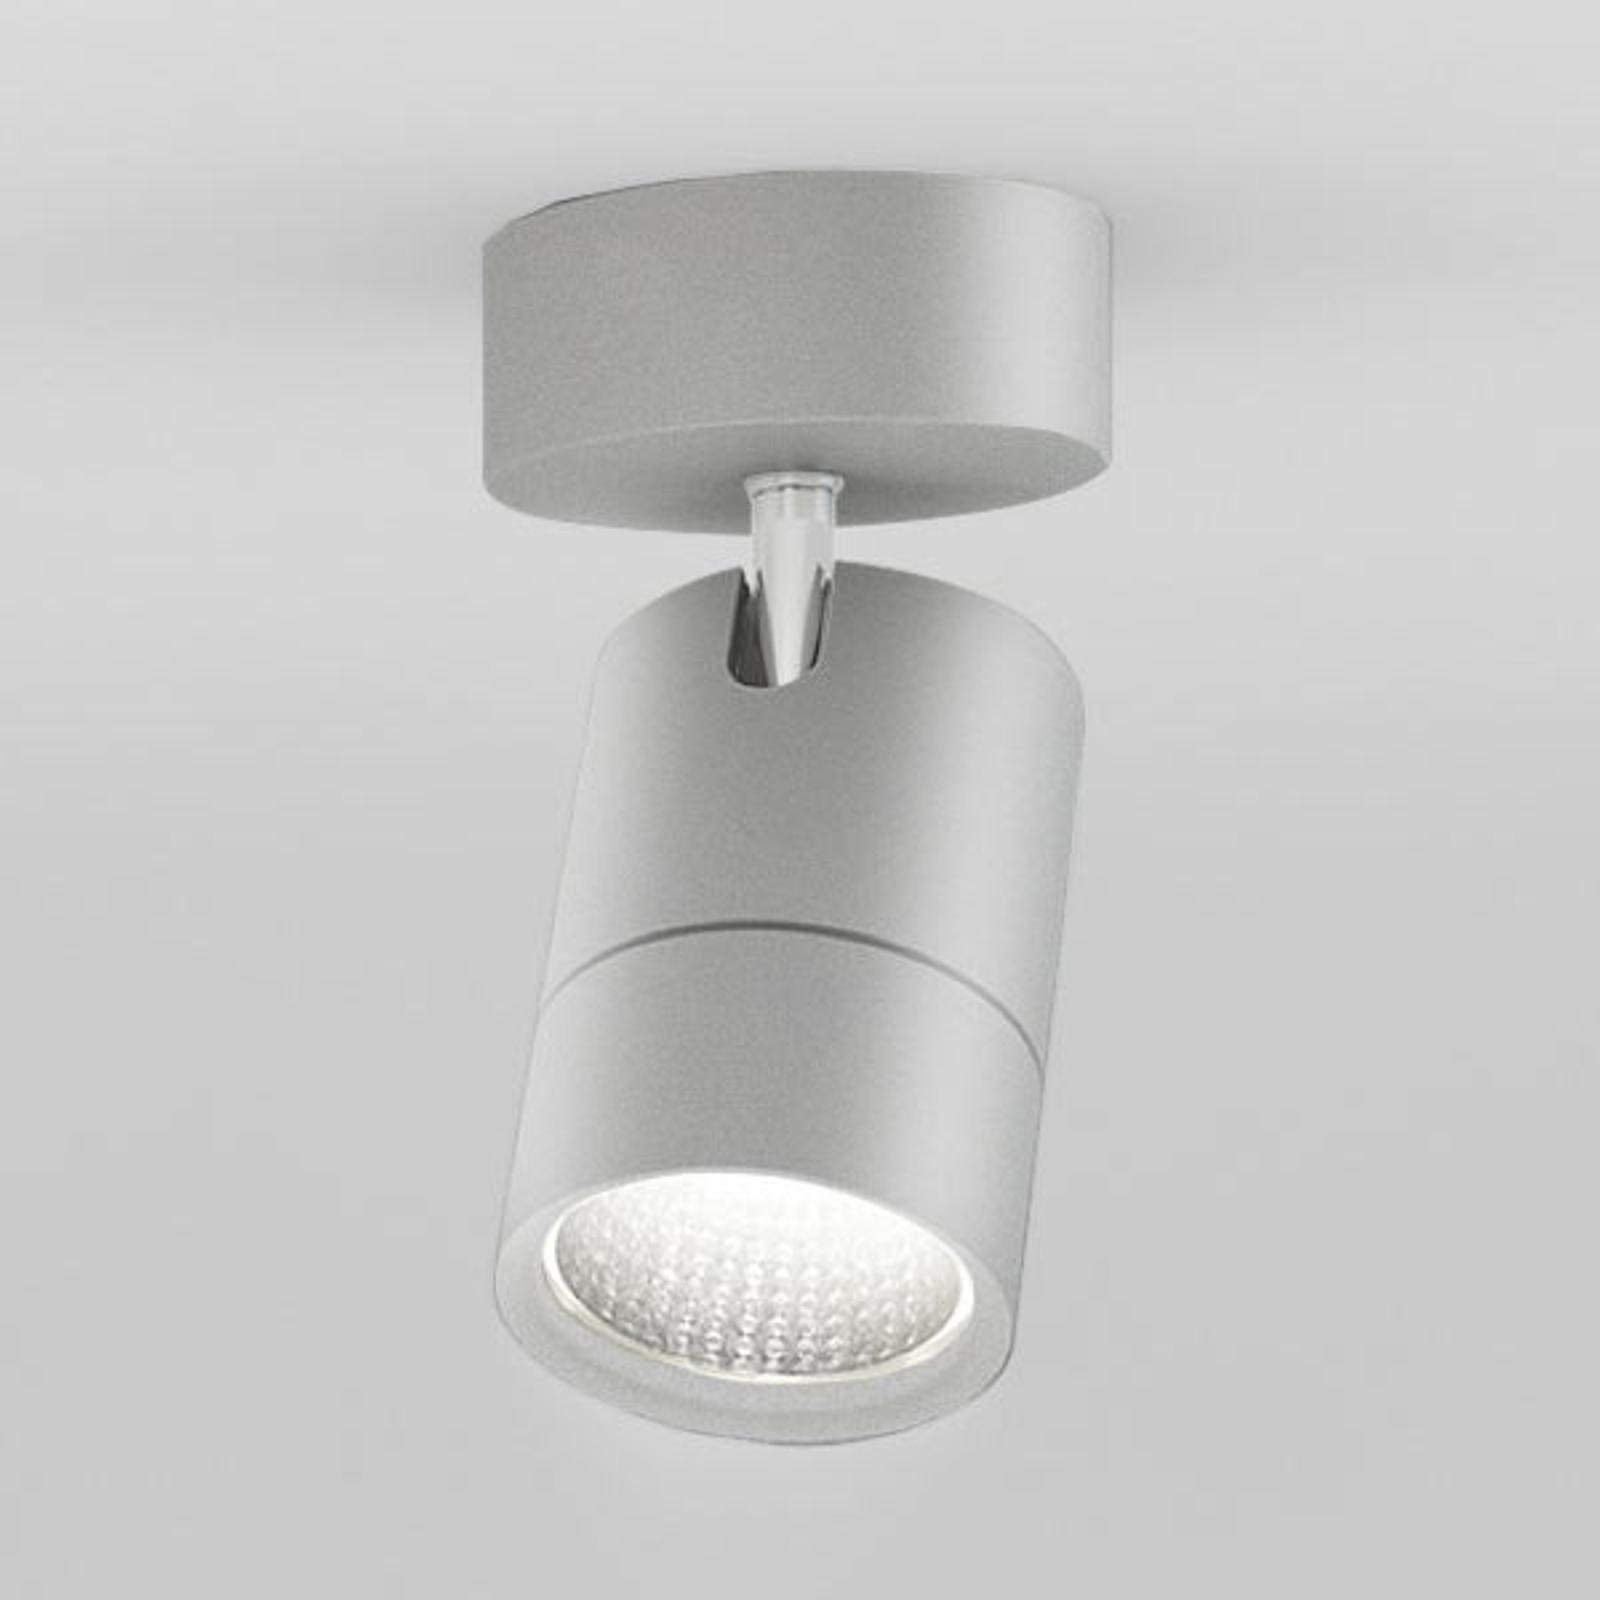 Acquista Spot LED Dash AC 11W medium argento 3.000K